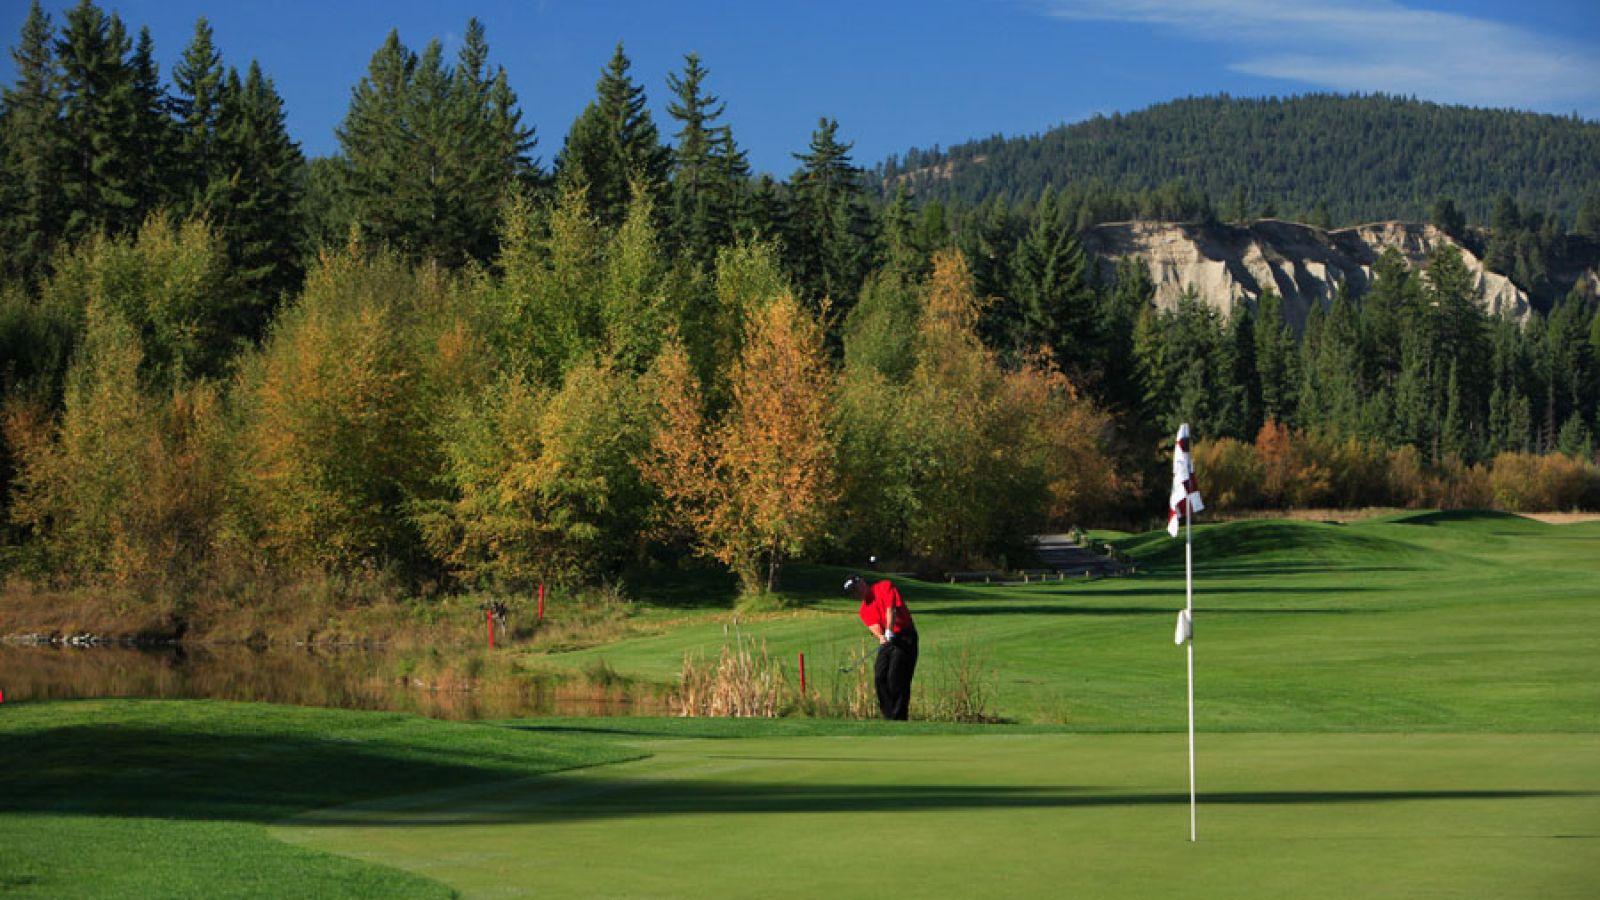 A Les Furber designed golf course.